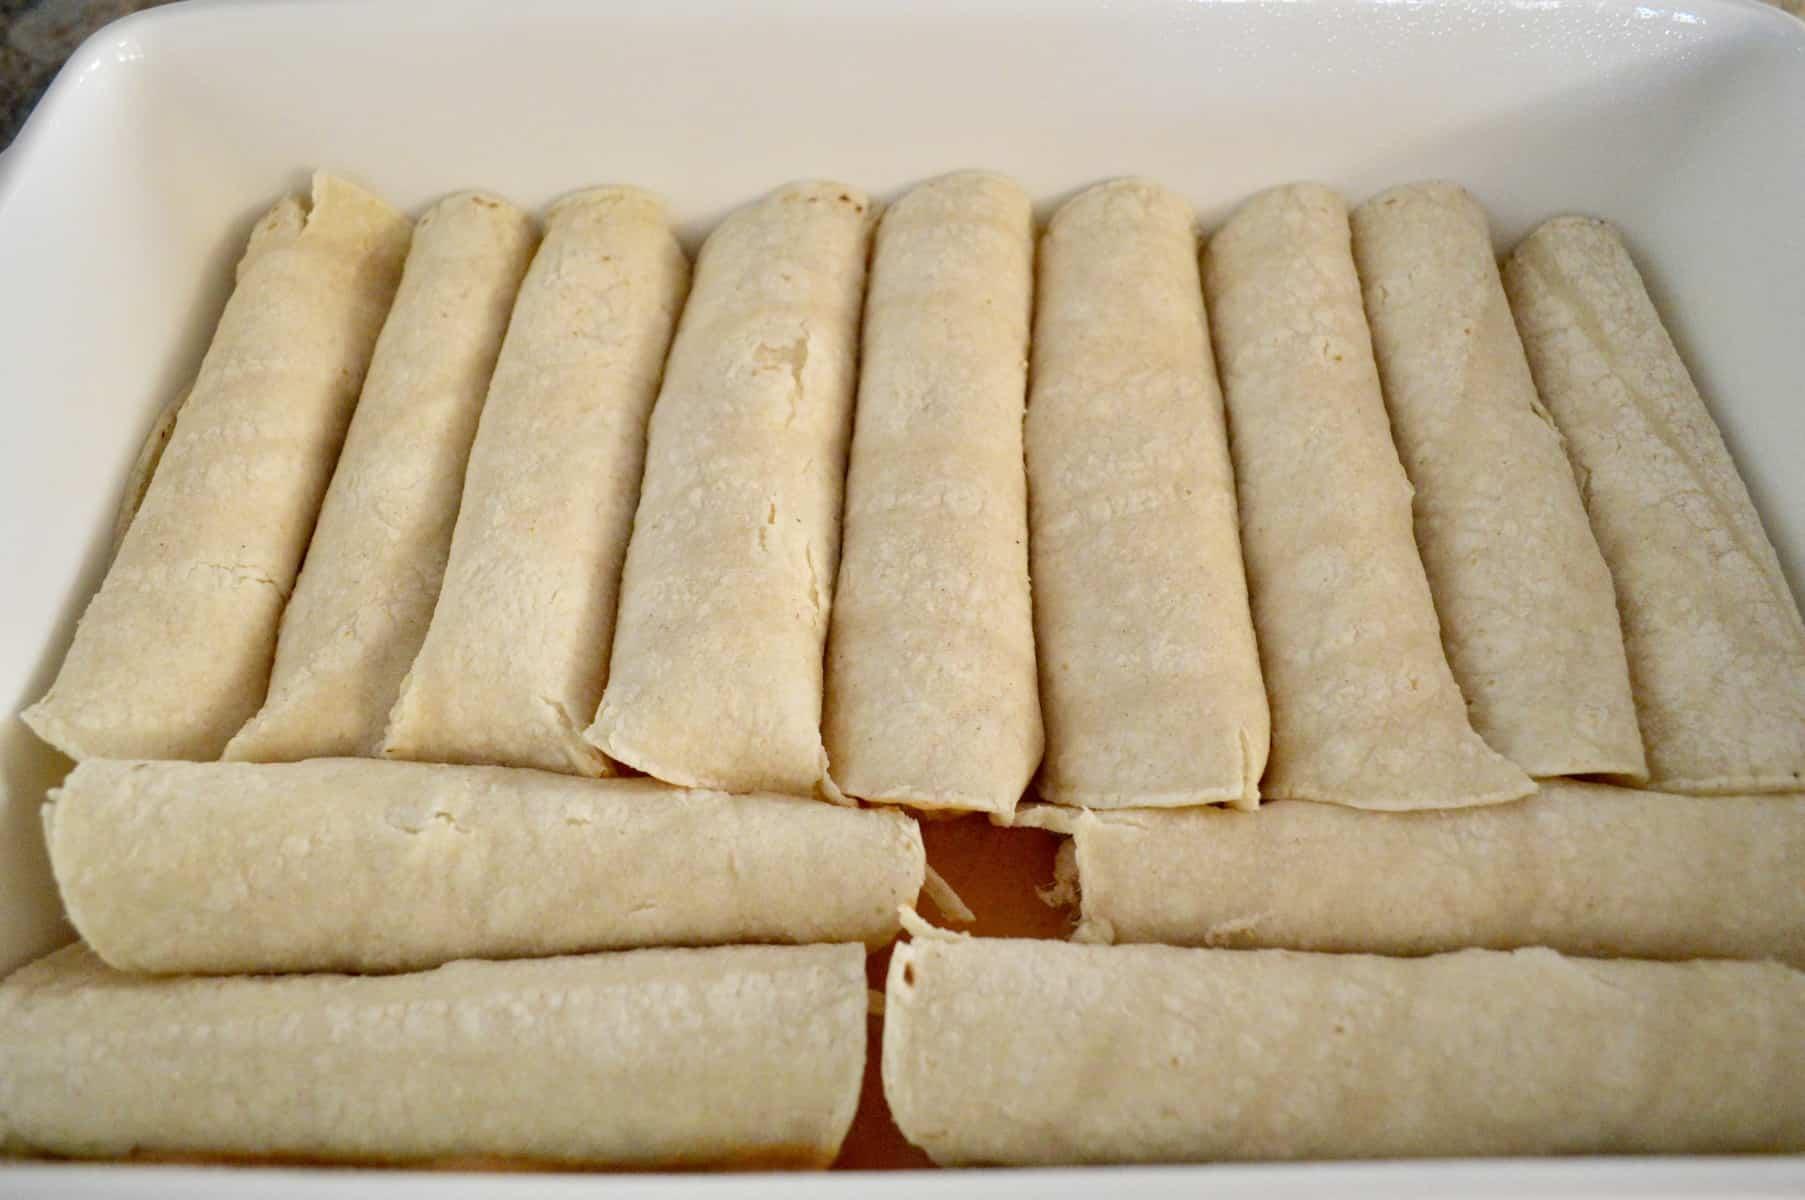 rolled enchiladas in a baking pan of sauce for cream cheese chicken enchiladas